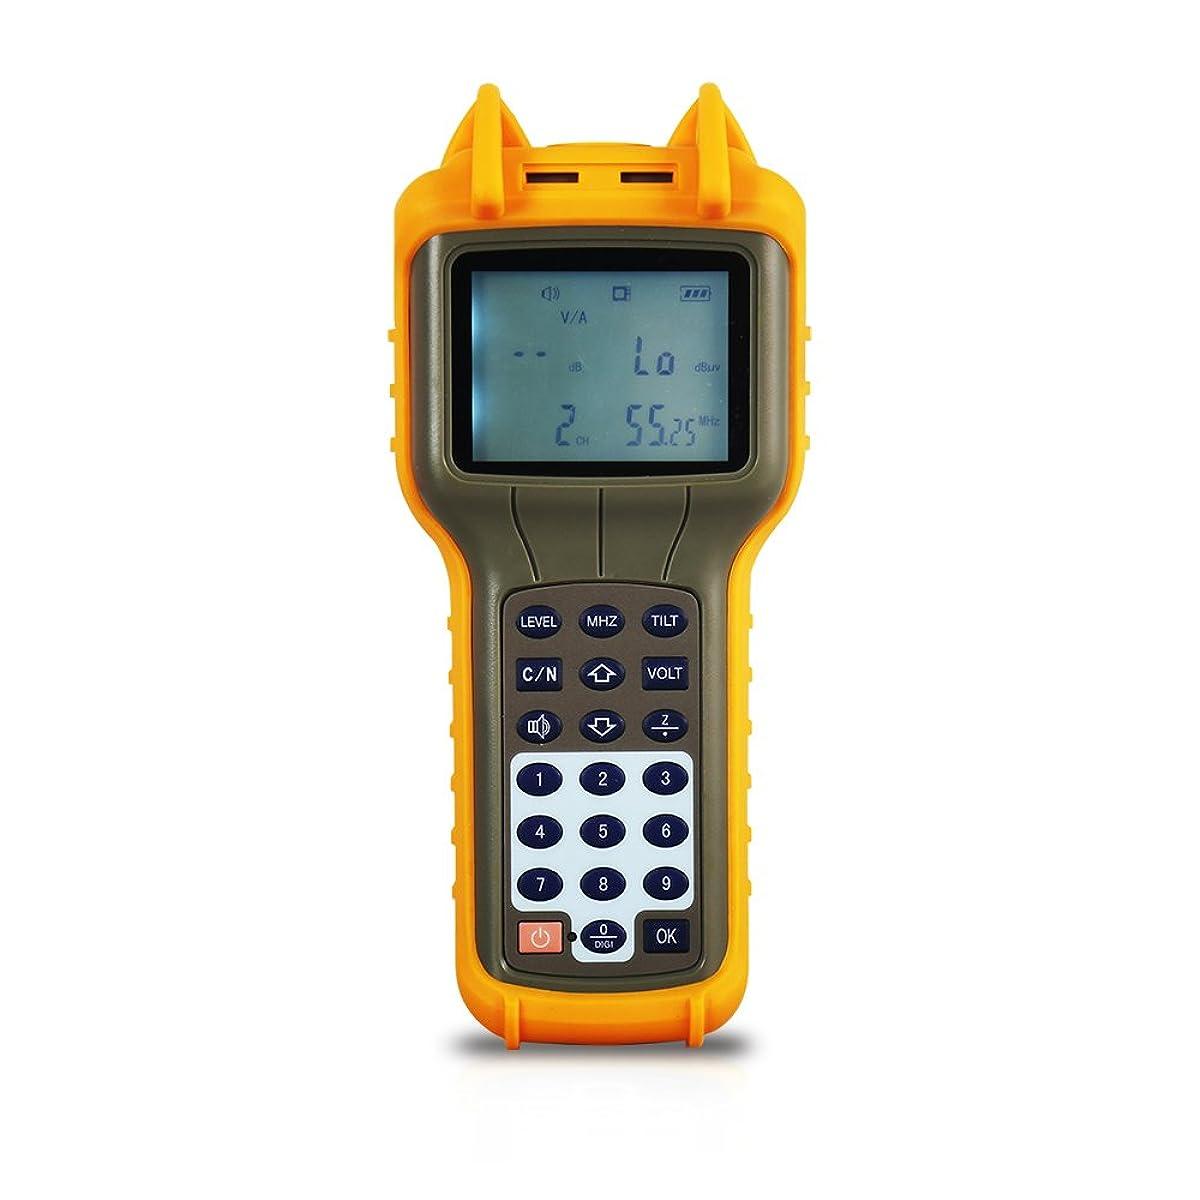 AUGOCOM RY S110 CATV Cable TV Handle Signal Level Meter DB Best Tester 47-870MHz